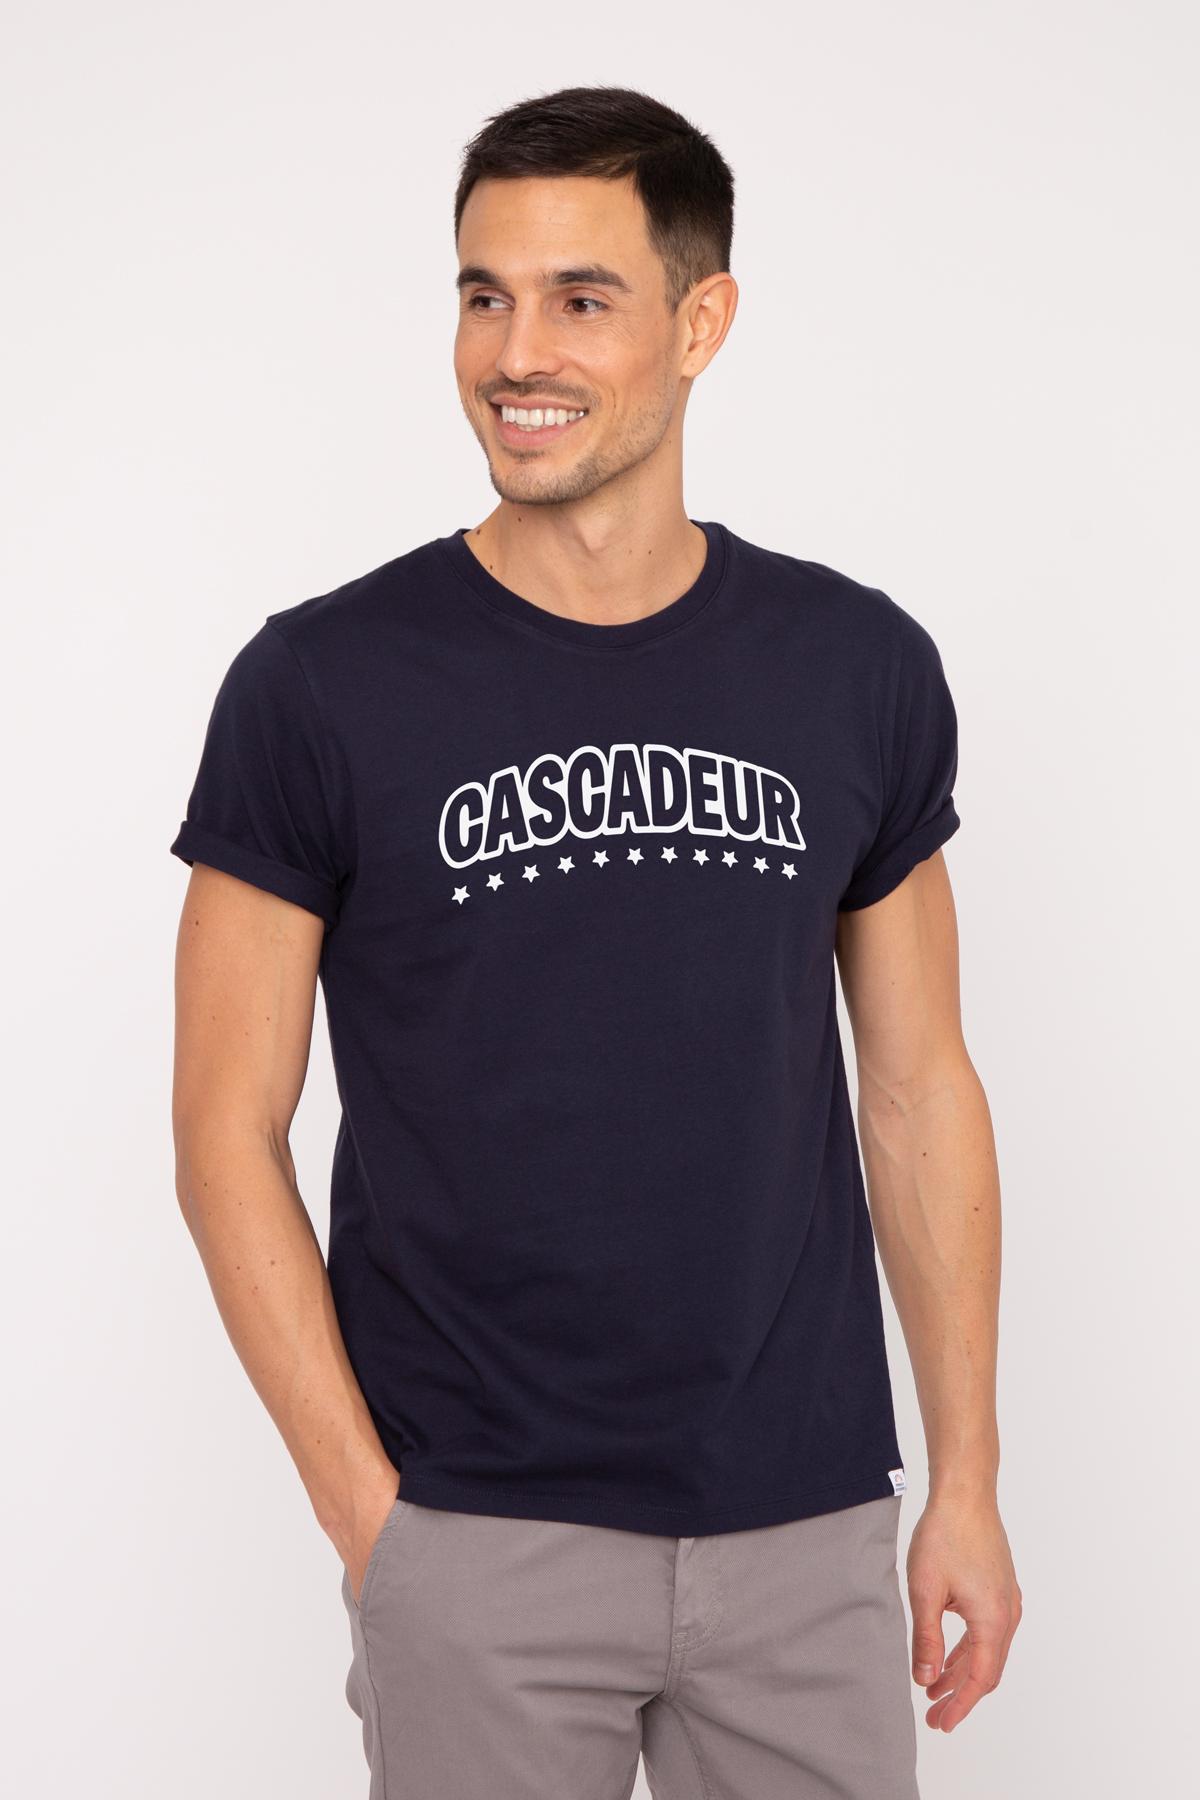 Tshirt CASCADEUR French Disorder